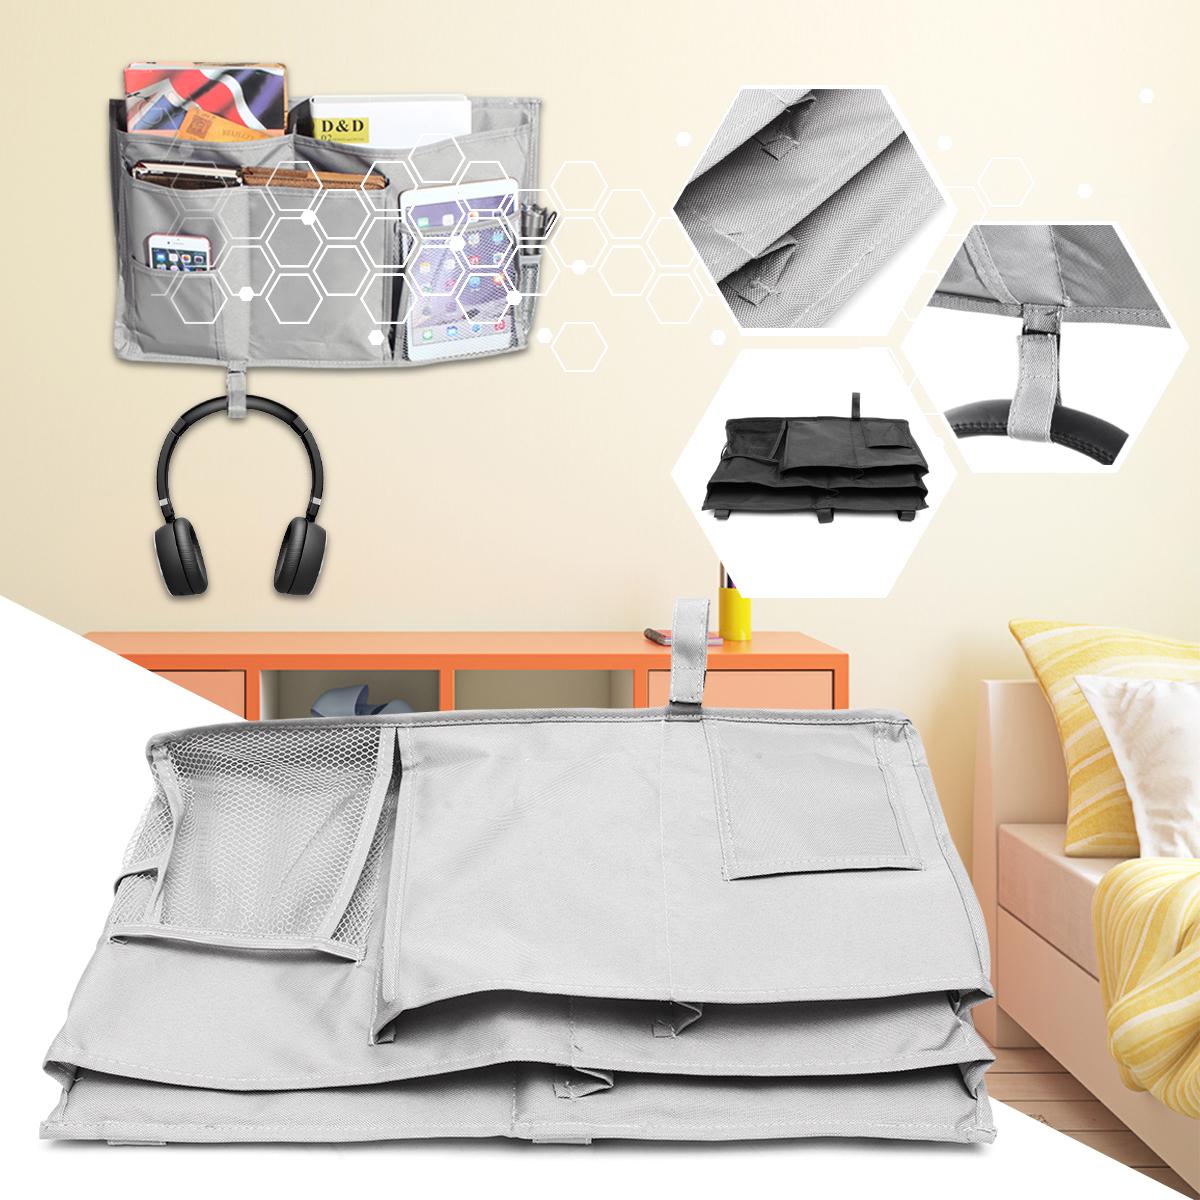 50x30cm/ 19.69x11.81'' Bedside Hanging Storage Pocket Organizer Holder Cabin Chair Shelf Bunk Baby Home Decor Bed Storage Boxes